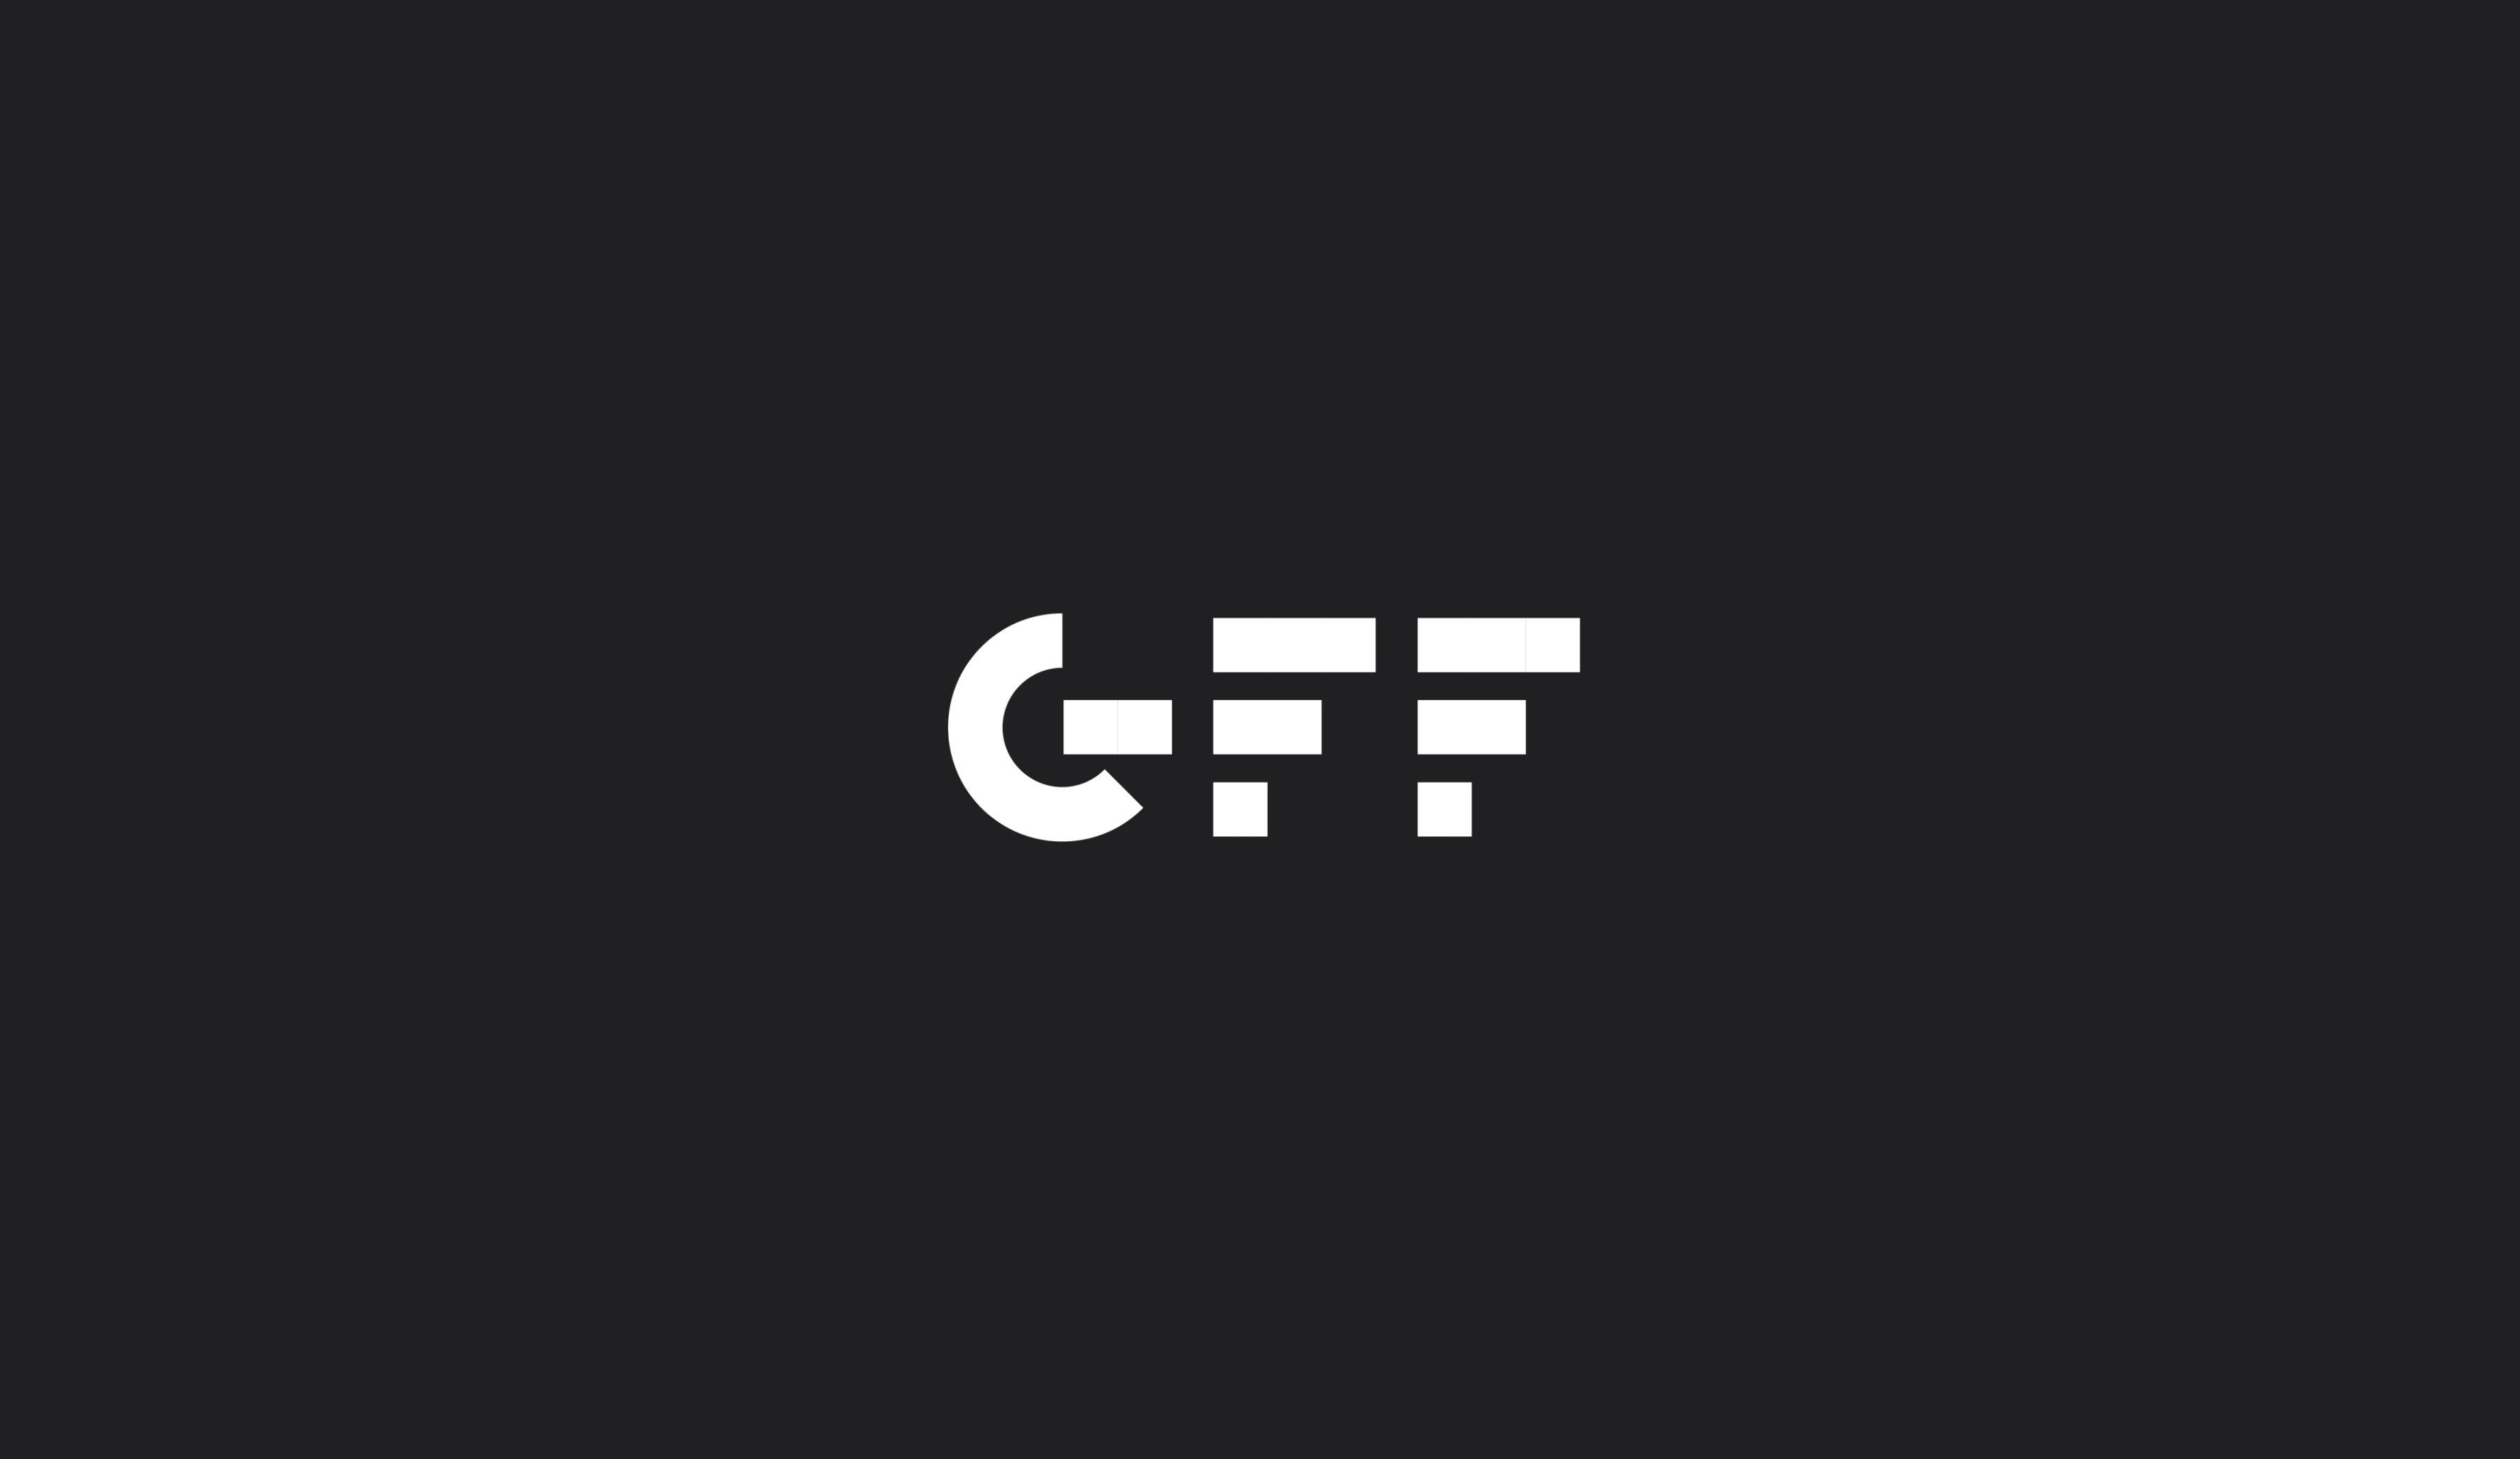 Gill Family Foundation logo design